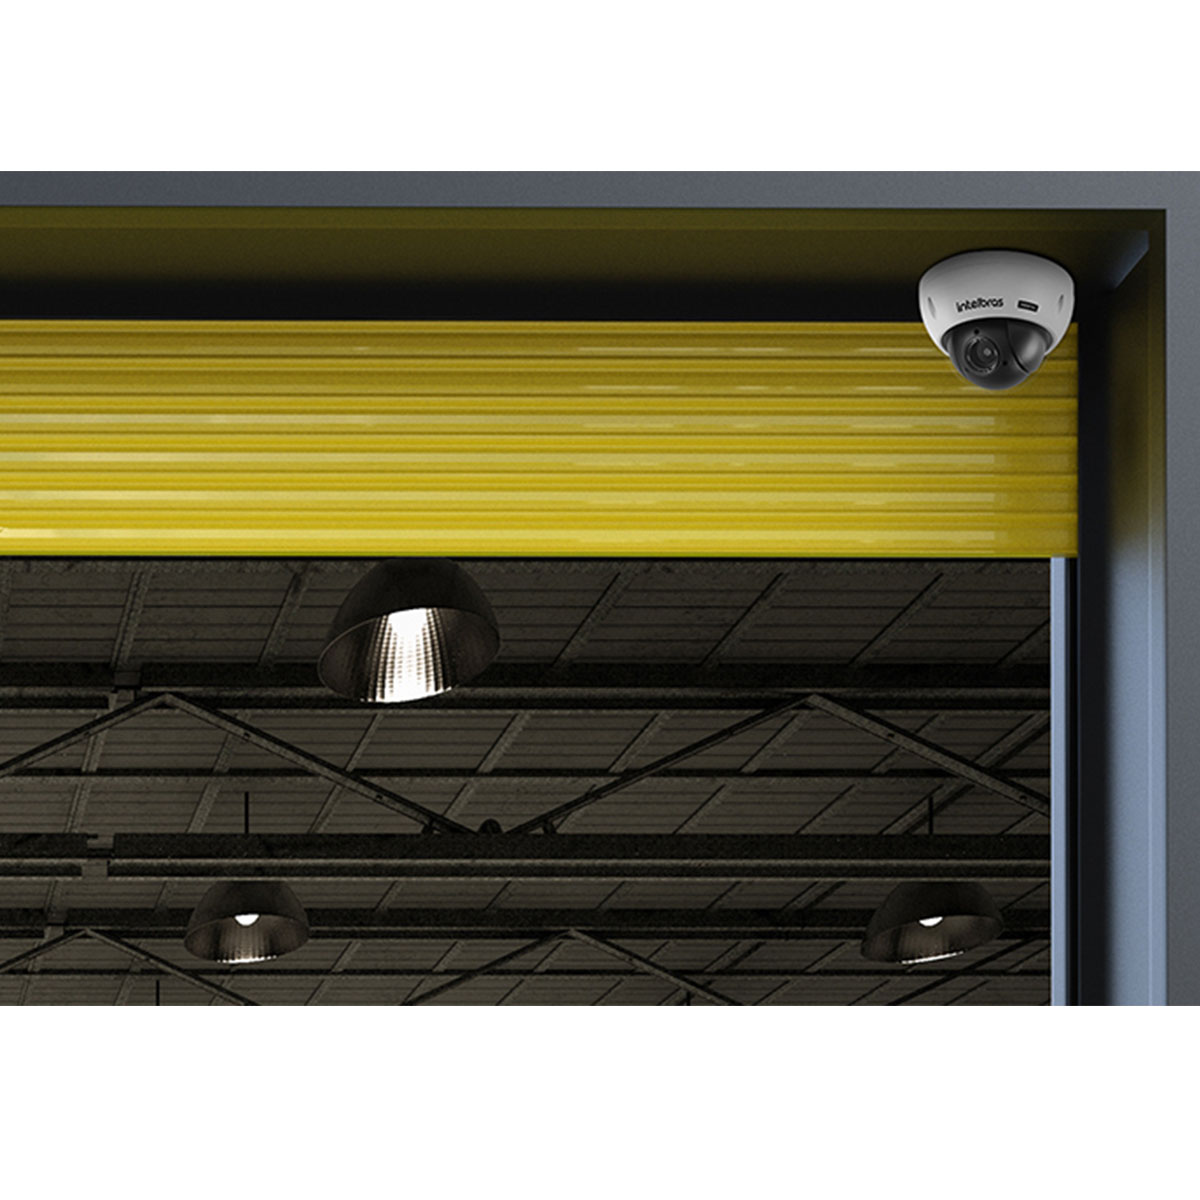 Câmera Speed Dome Intelbras HDCVI  VHD 5205 SD Full HD 1080p IK10 IP66 2.7 - 11 mm